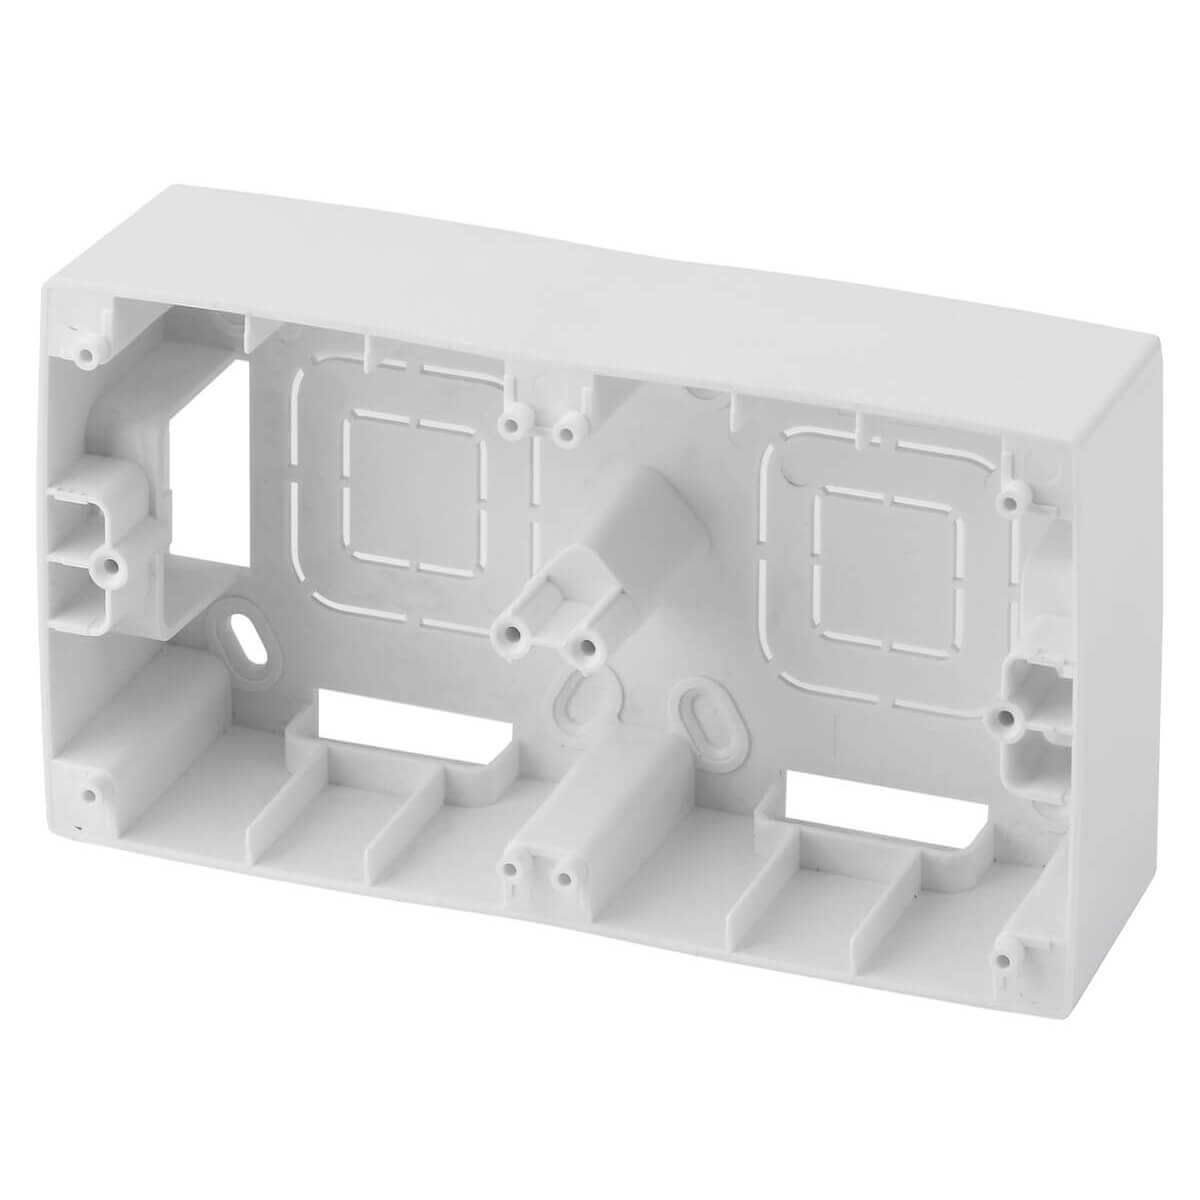 Монтажная коробка ЭРА 12-6102-01 Эра12